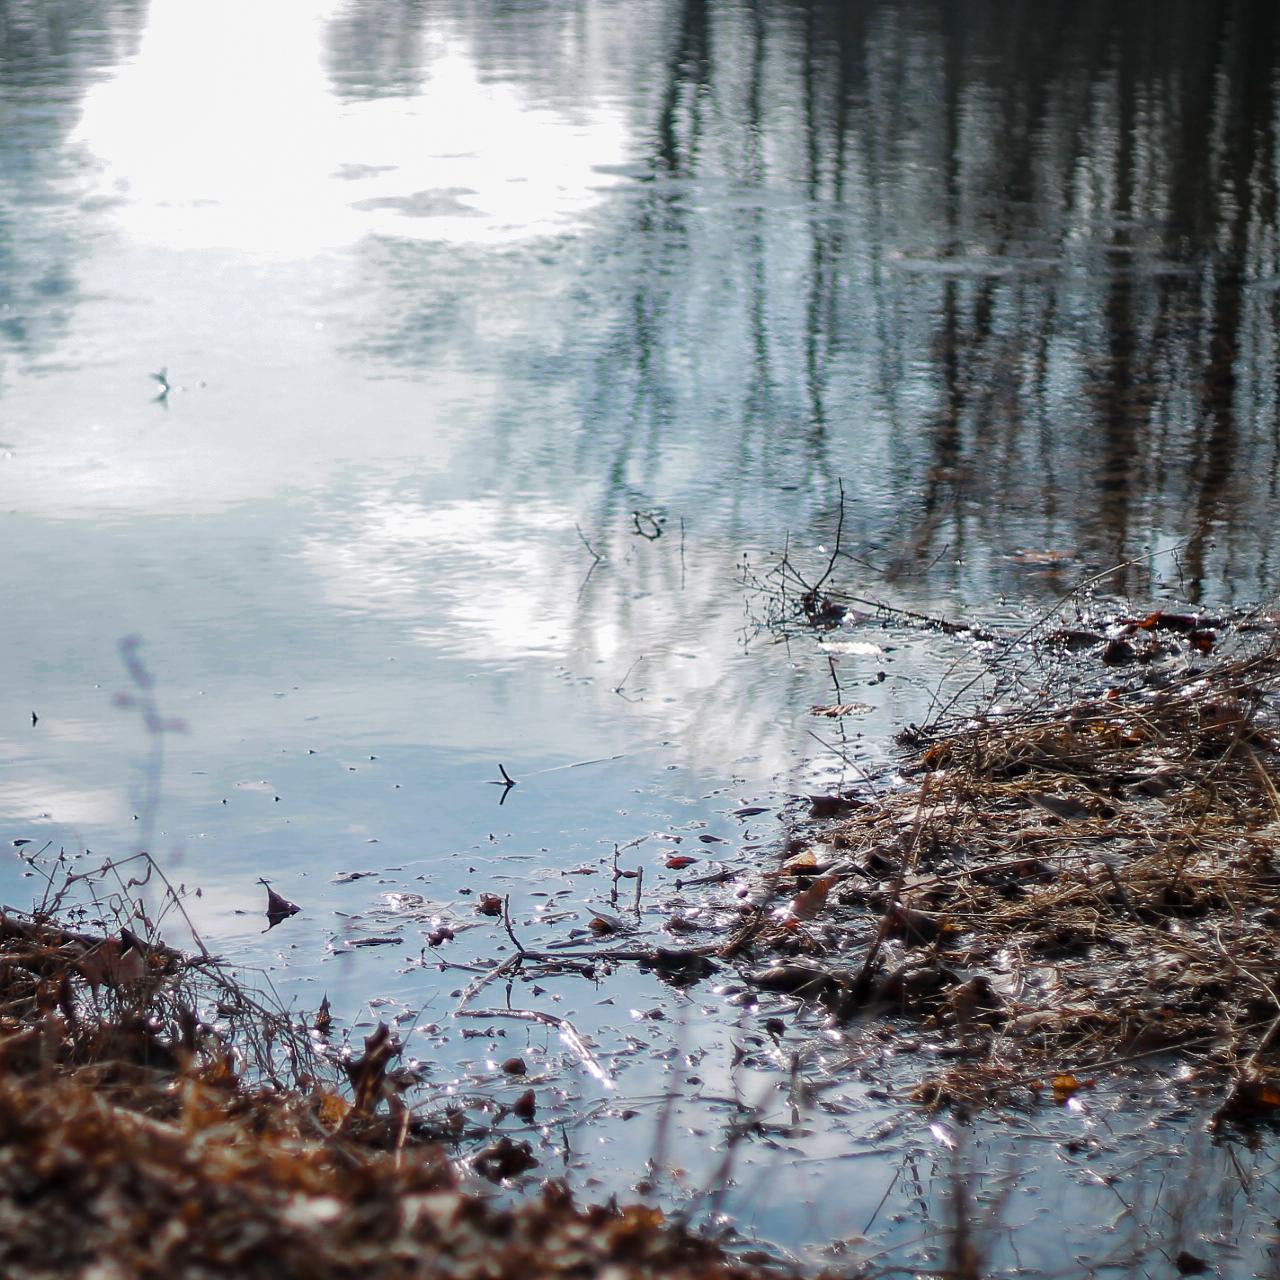 River Flows